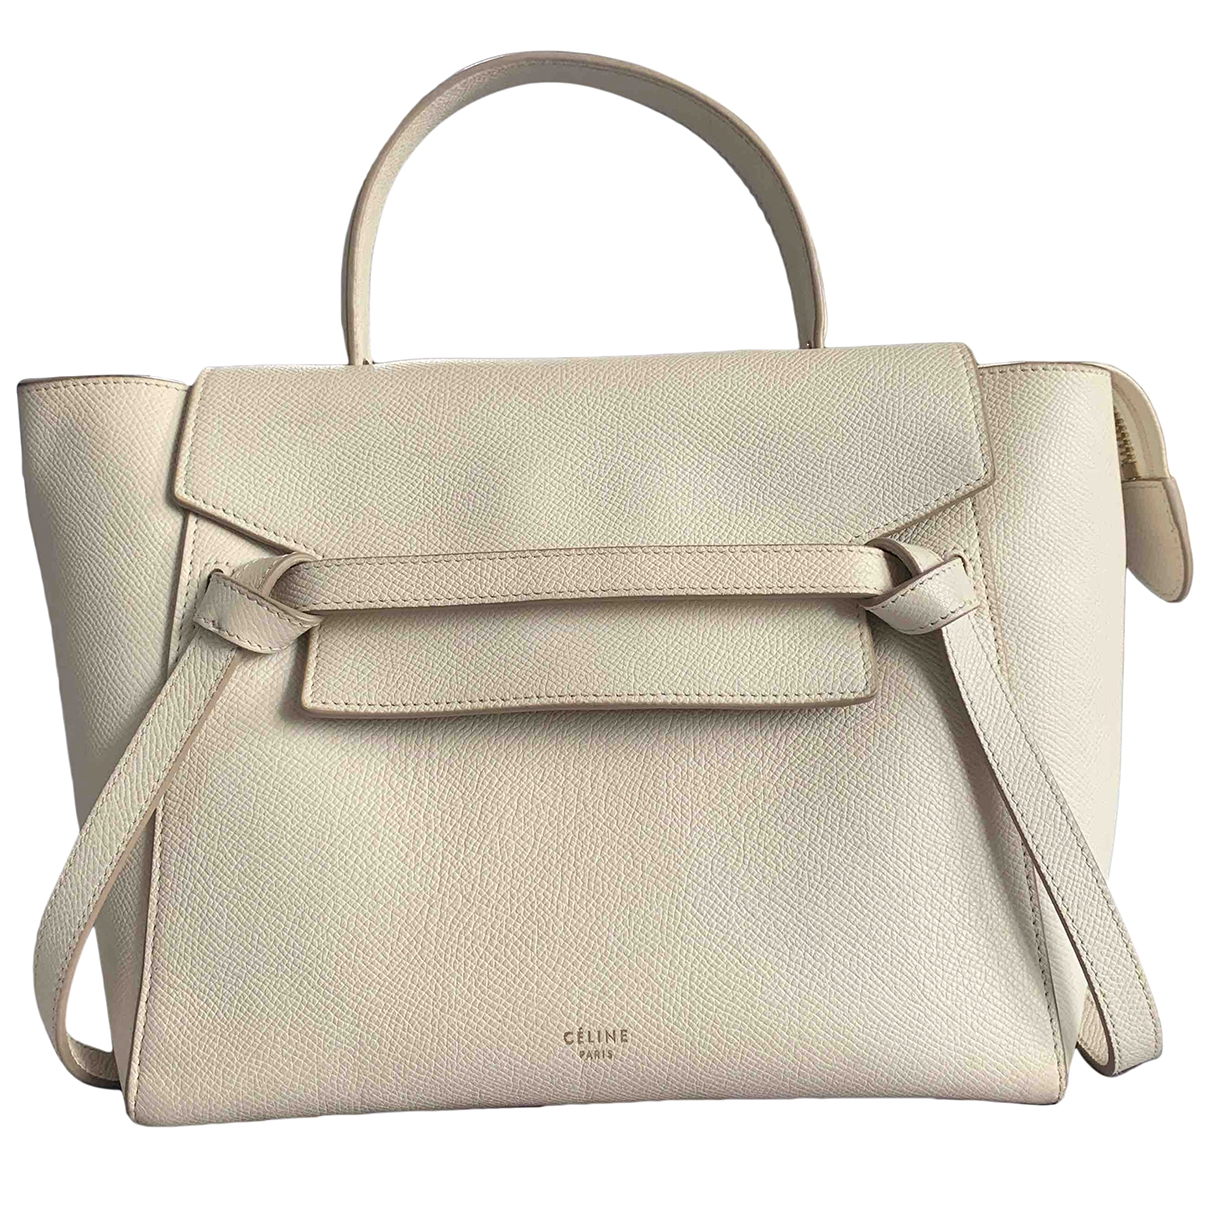 Celine Belt Handtasche in  Beige Leder